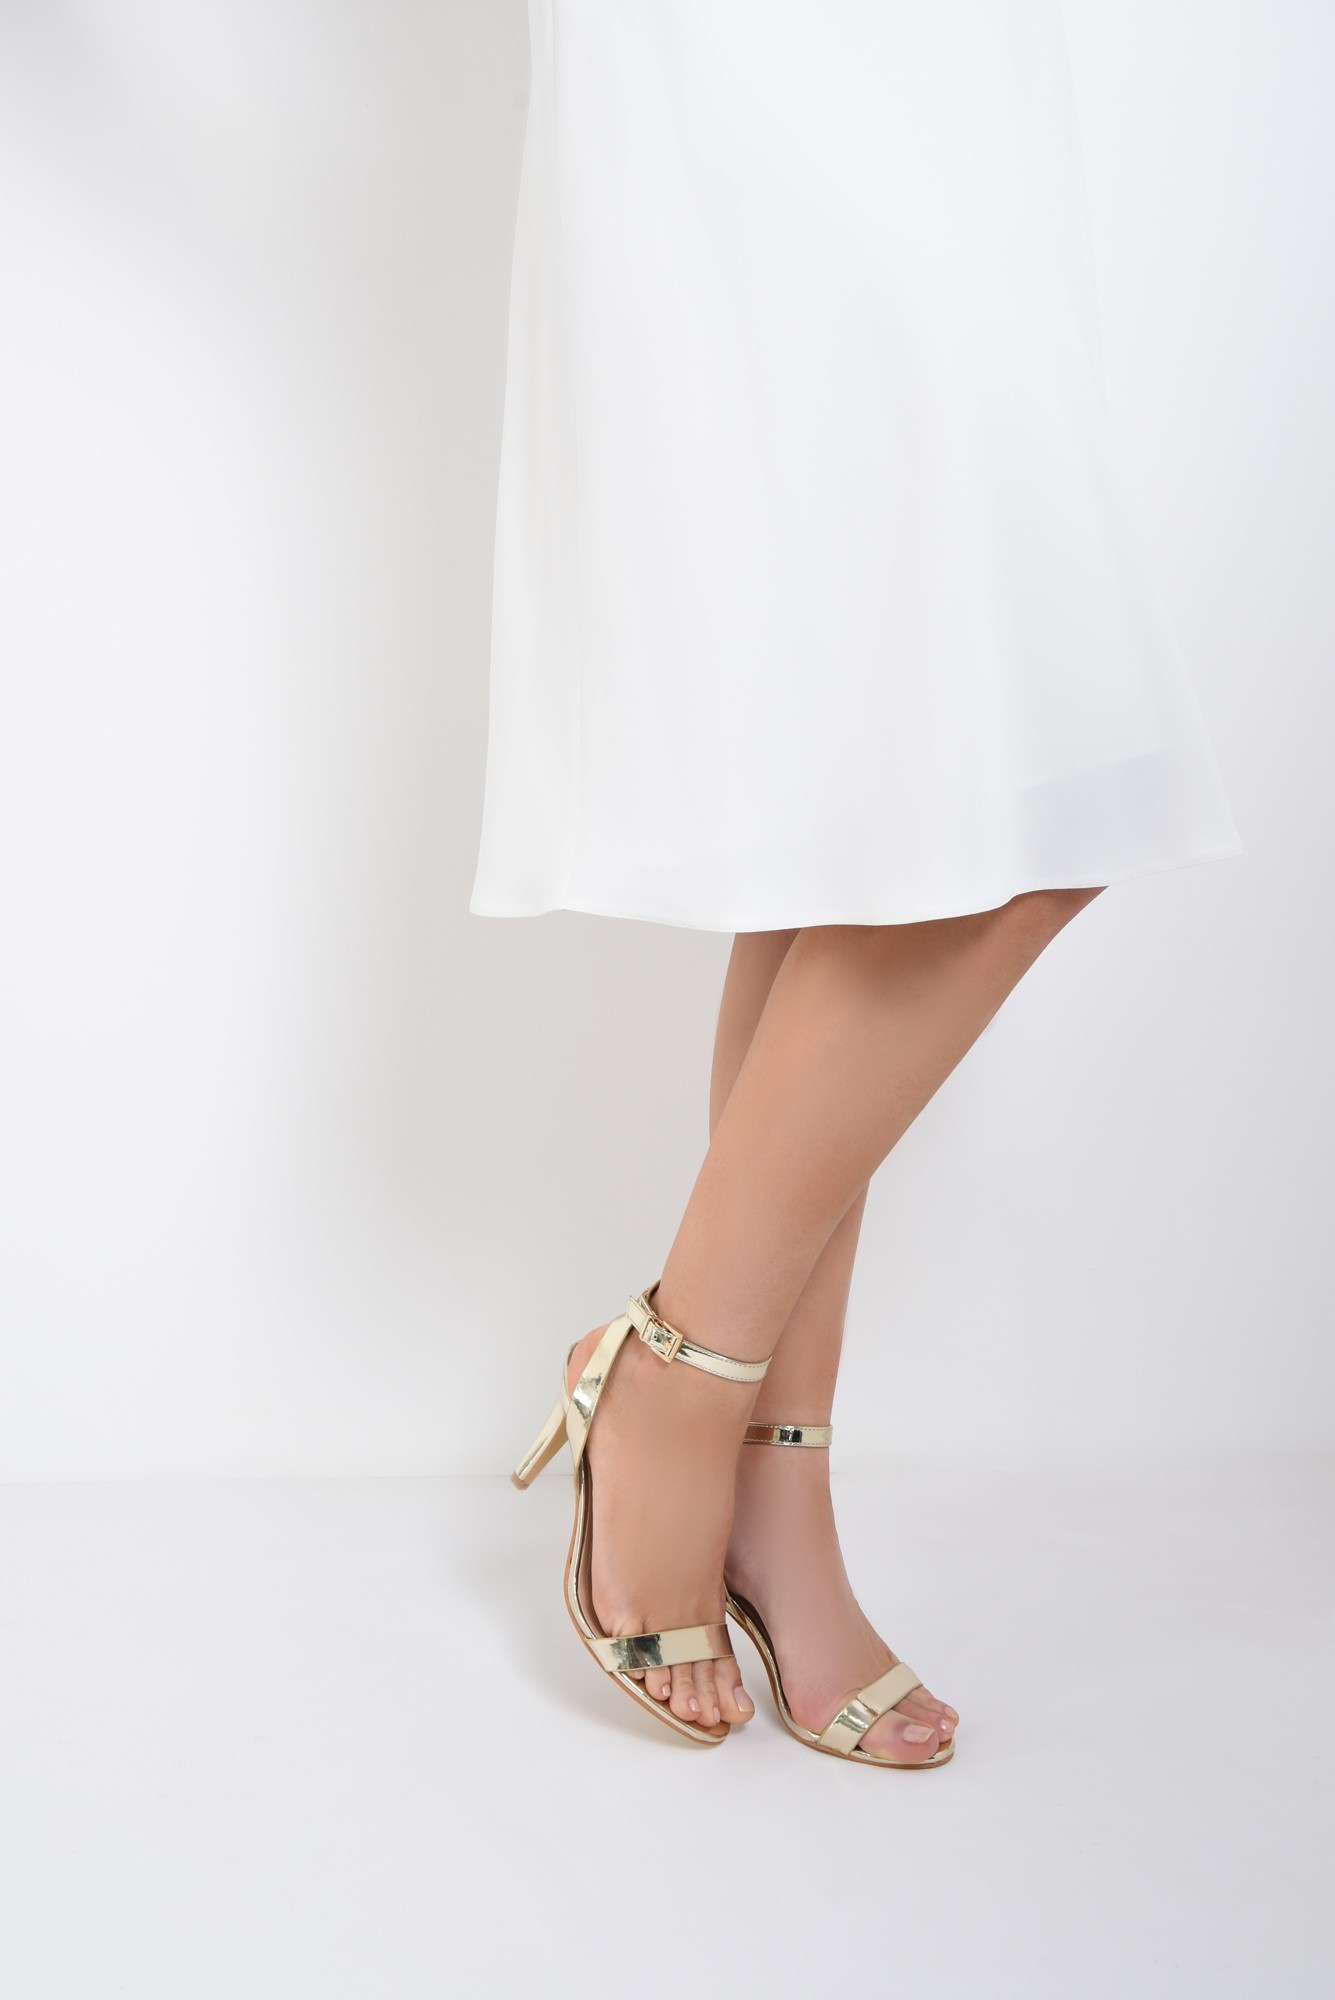 4 - sandale elegante, aurii, cu toc subtire